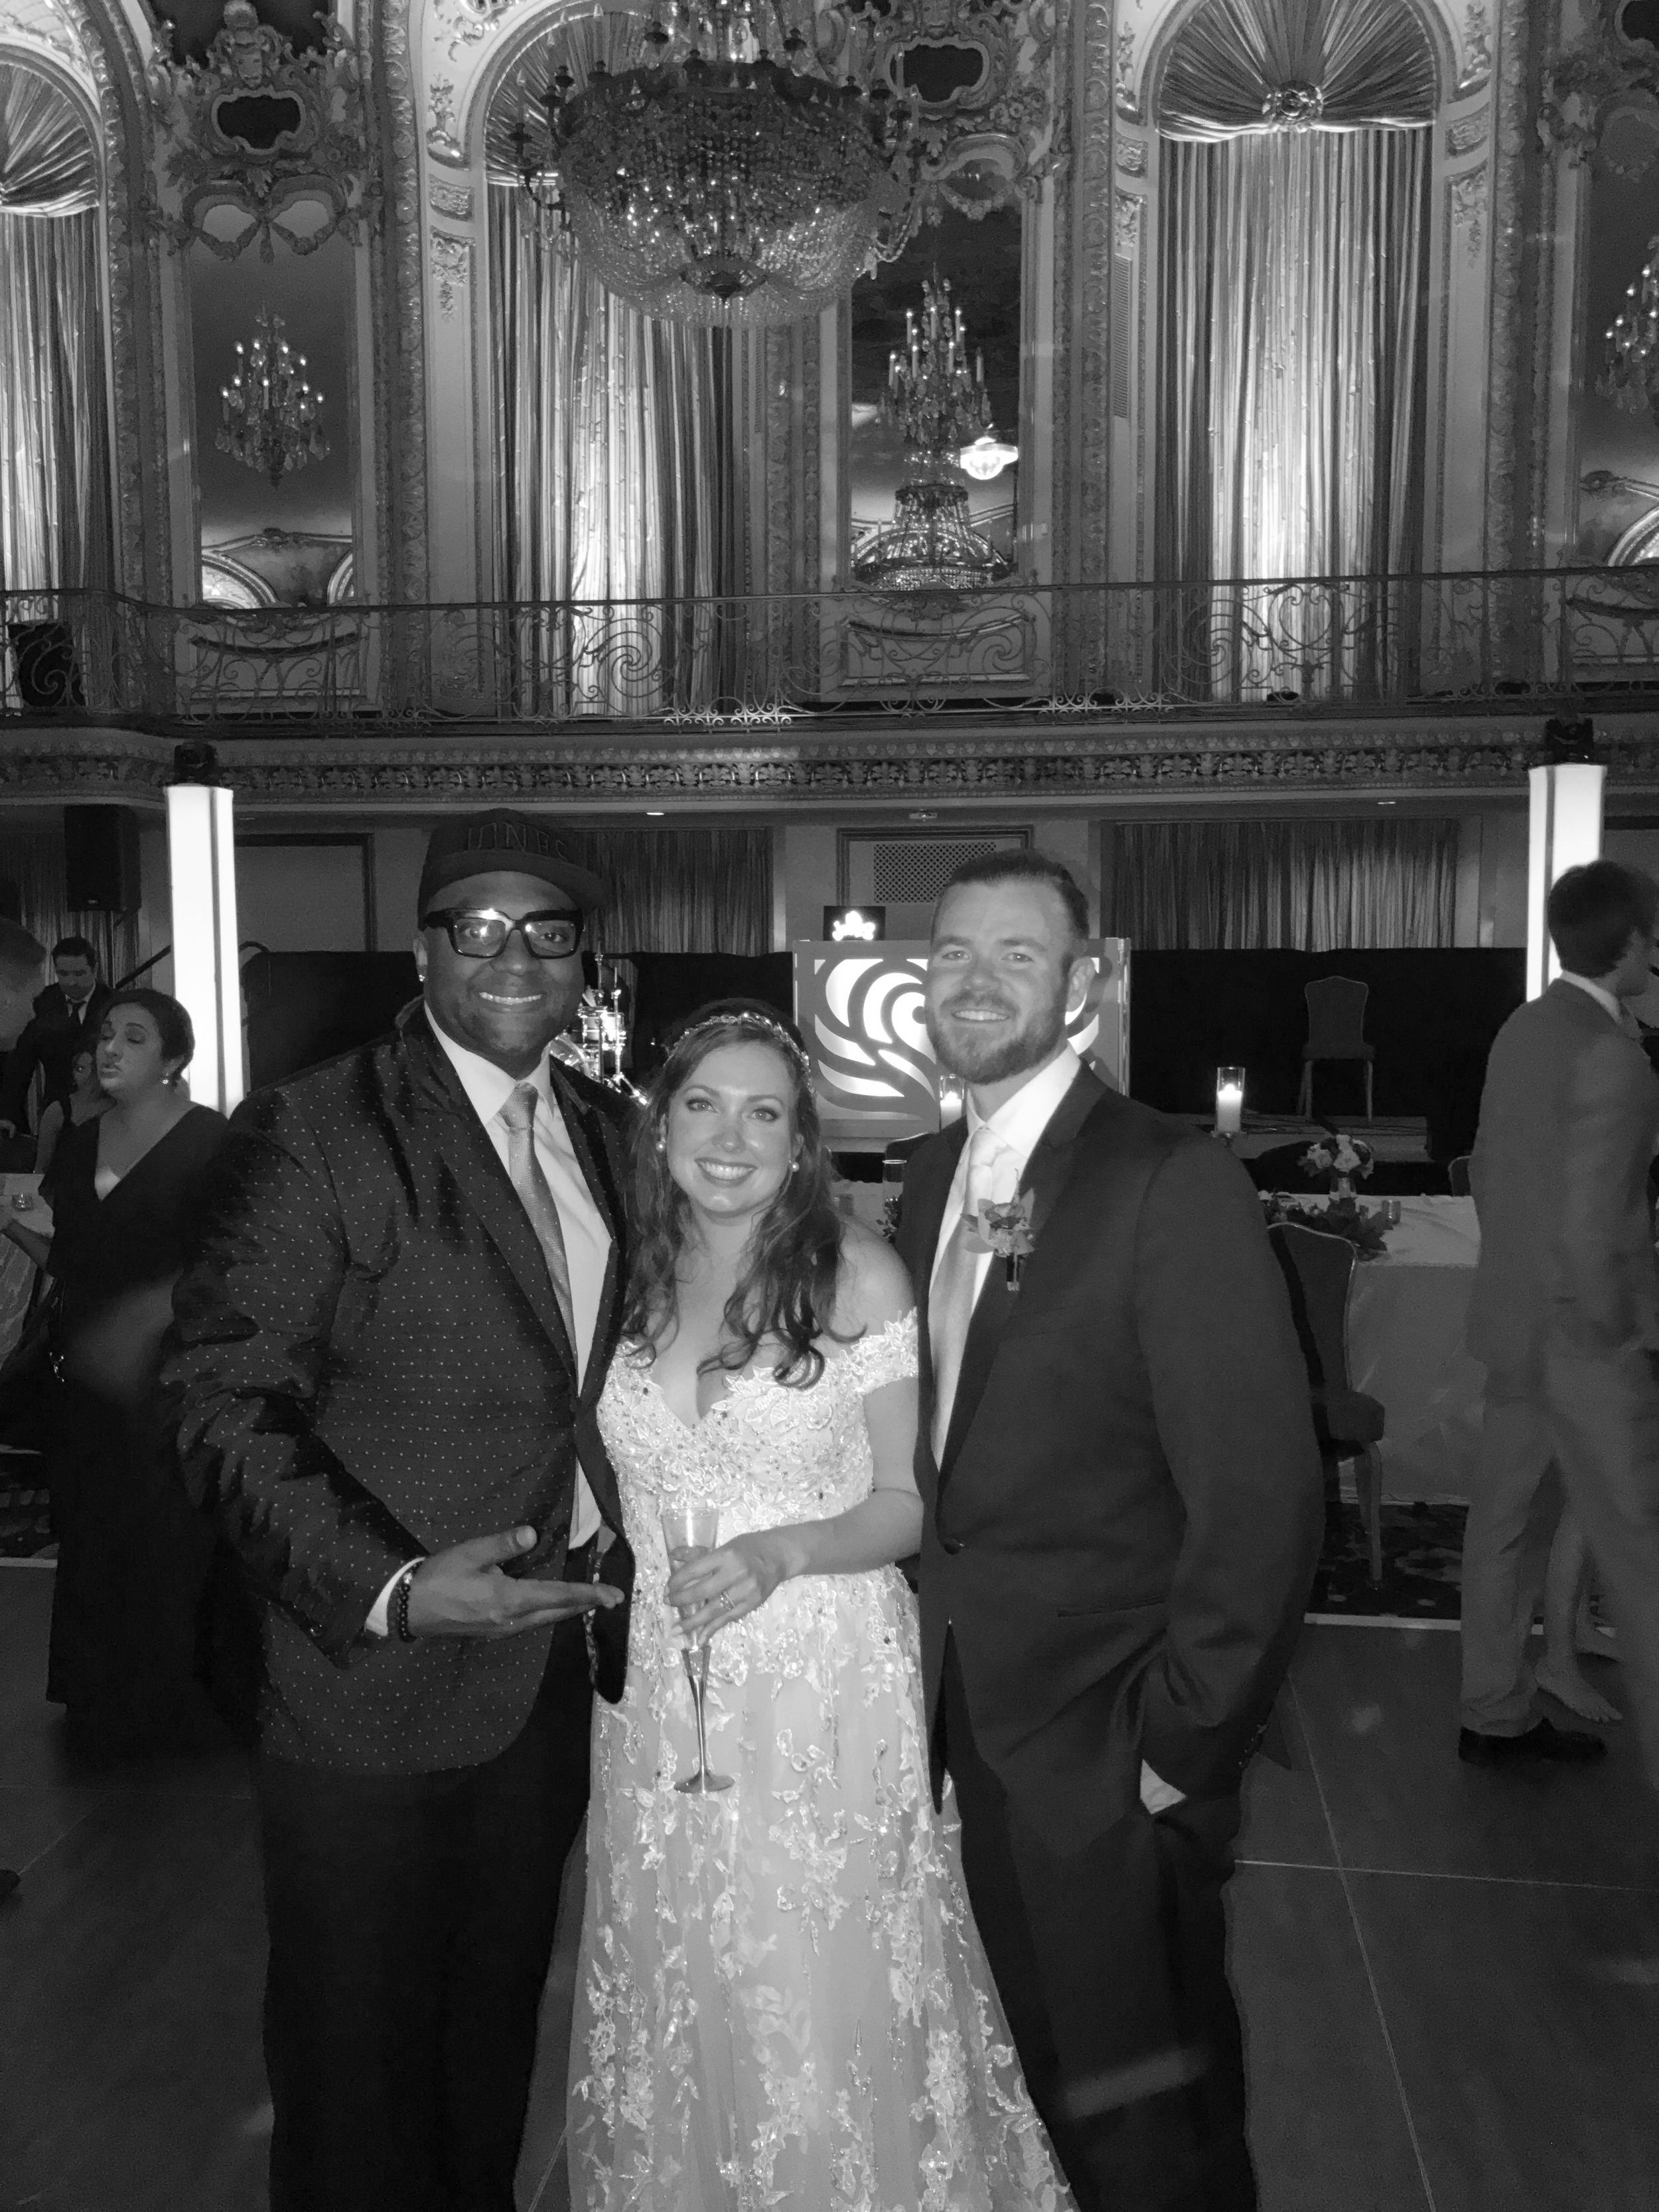 Gorecki  Konieczny Wedding by dj d jones luxury hilton magnificent mile million dollar .JPG